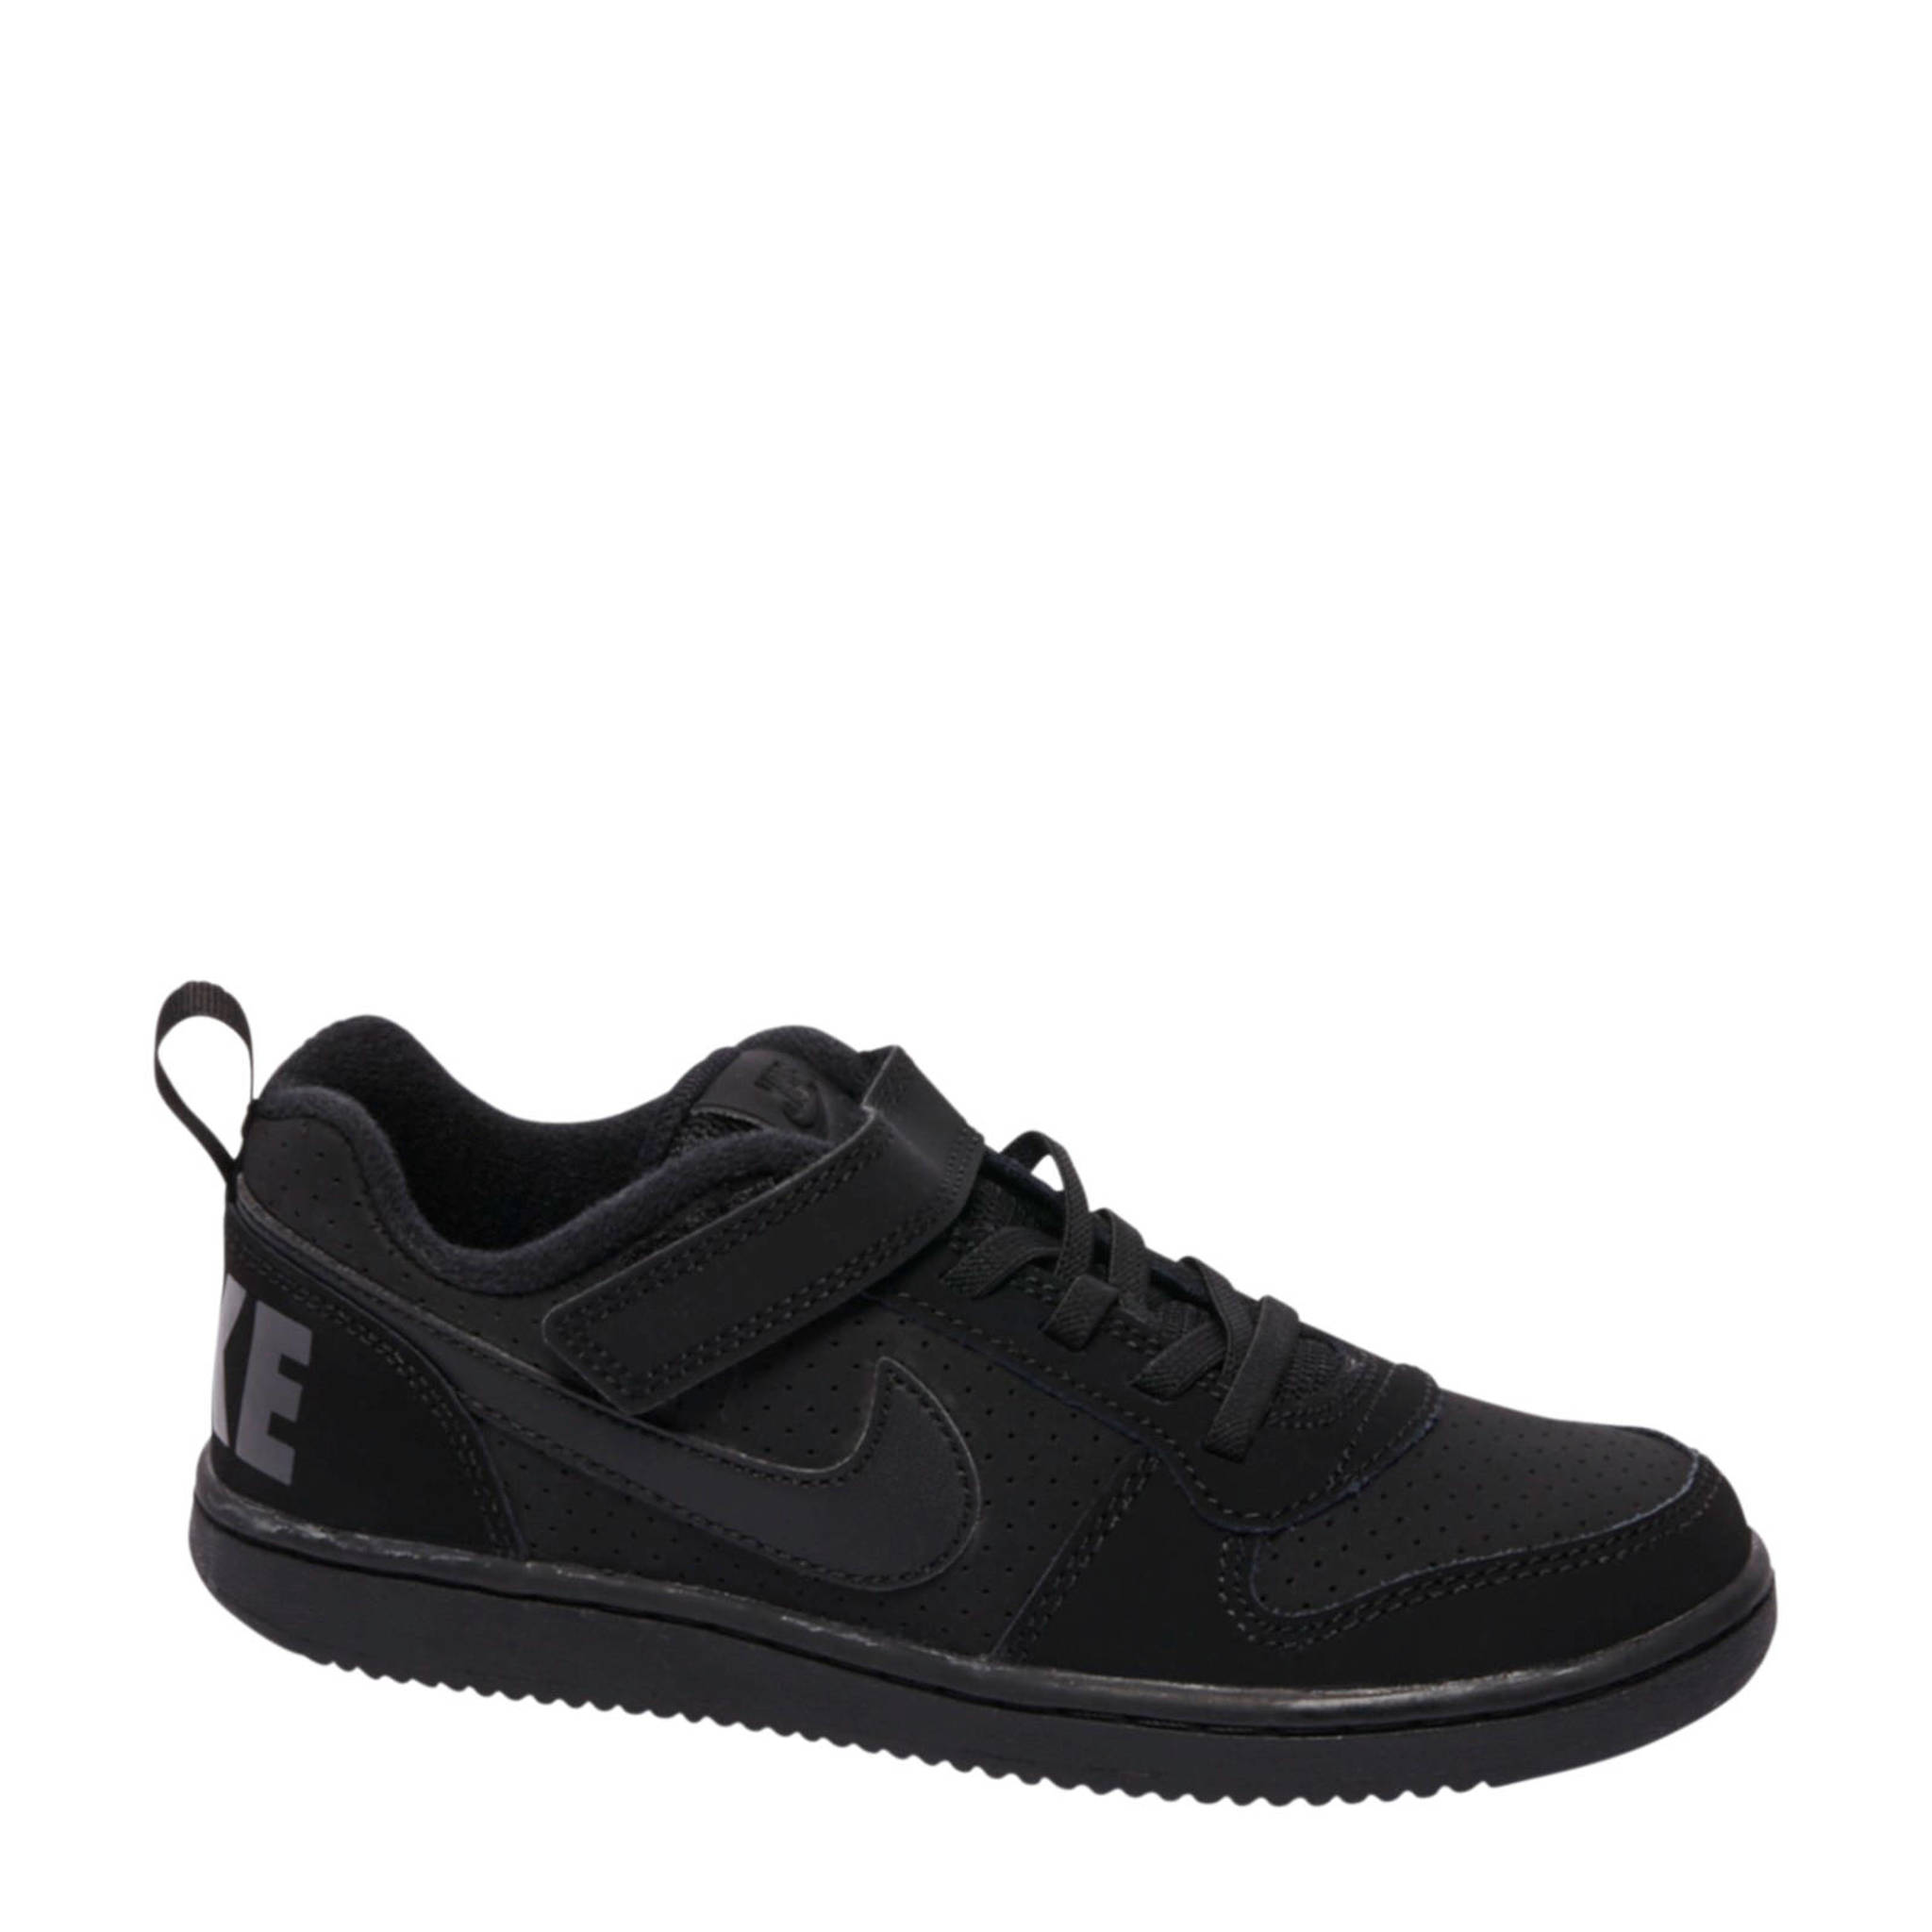 9529a16f7f1 Nike Court Borough LOW sneakers | wehkamp